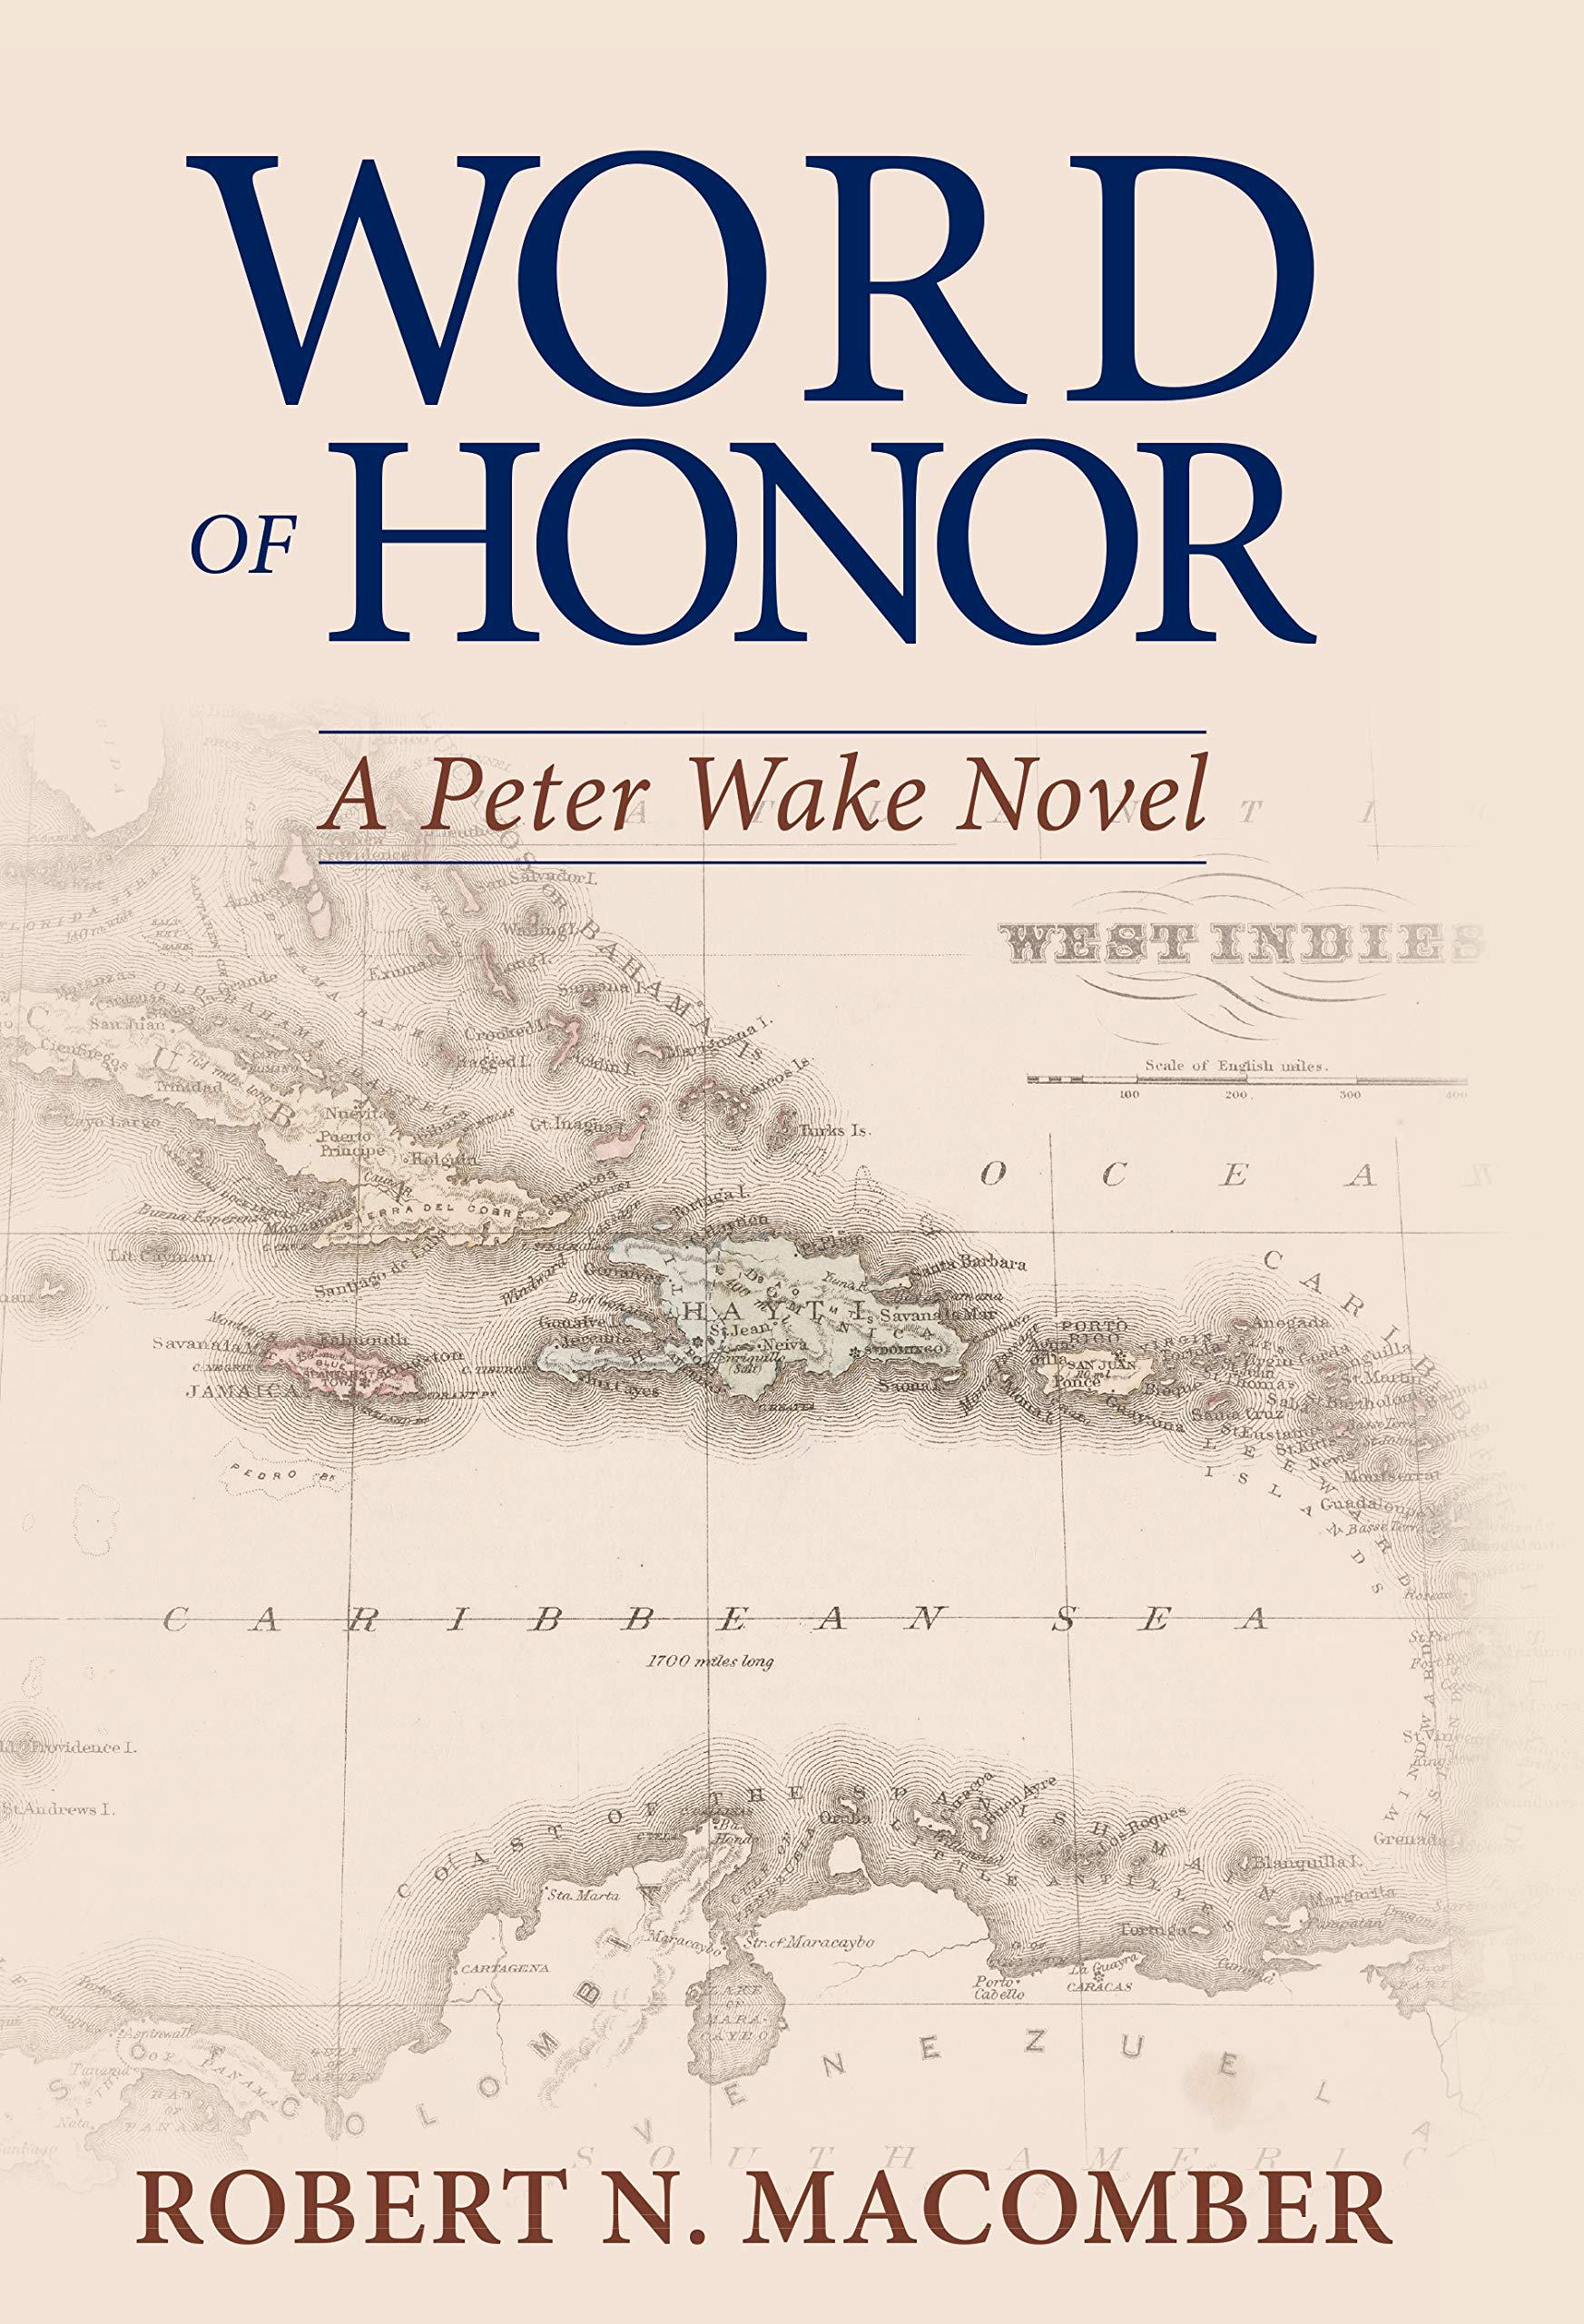 Word of Honor: A Peter Wake Novel